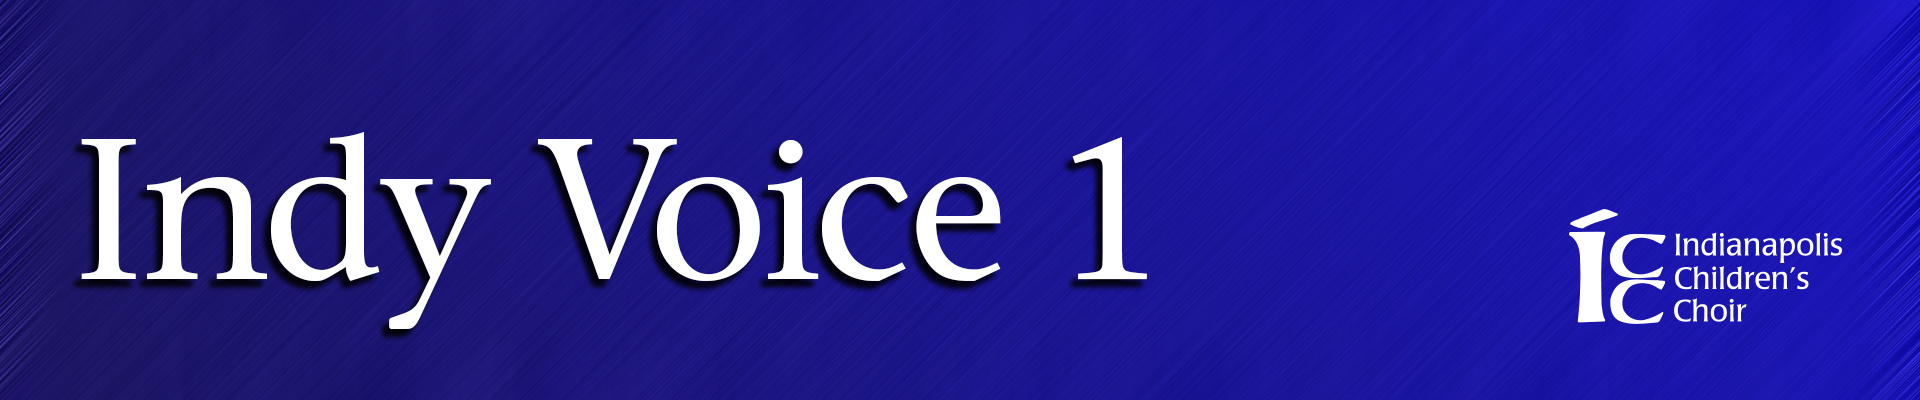 indy voice 1